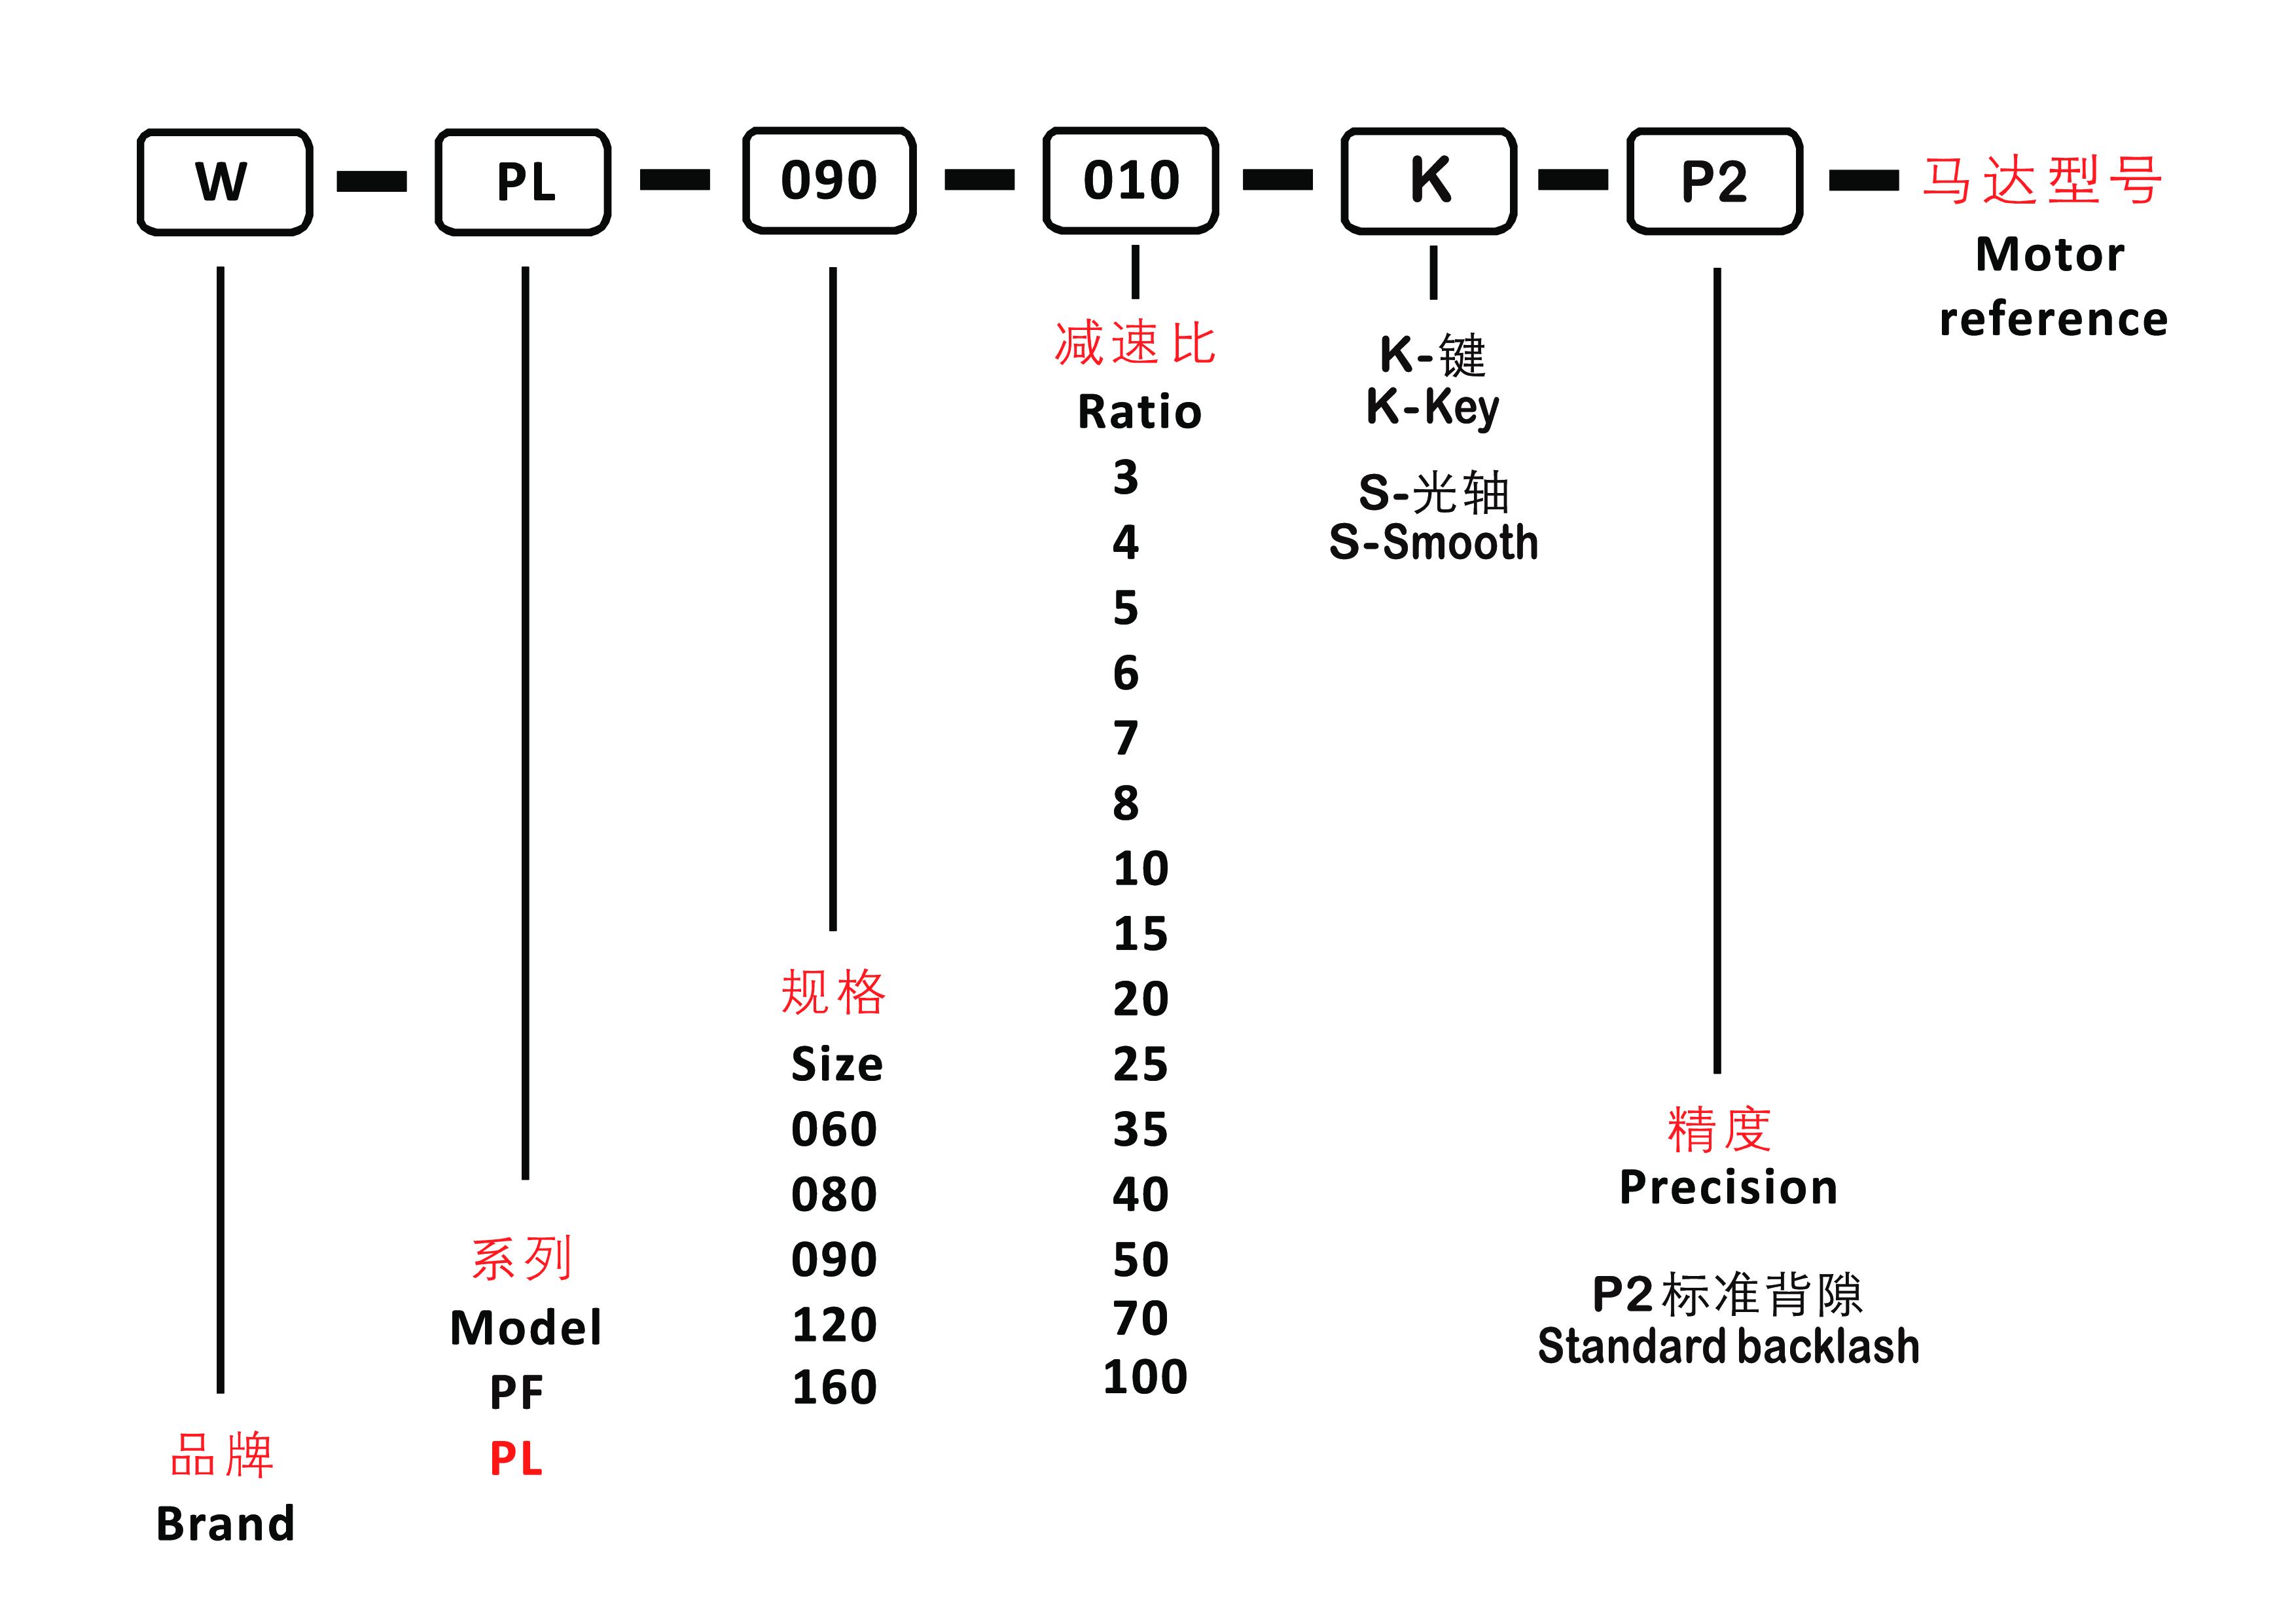 система обозначений PL.